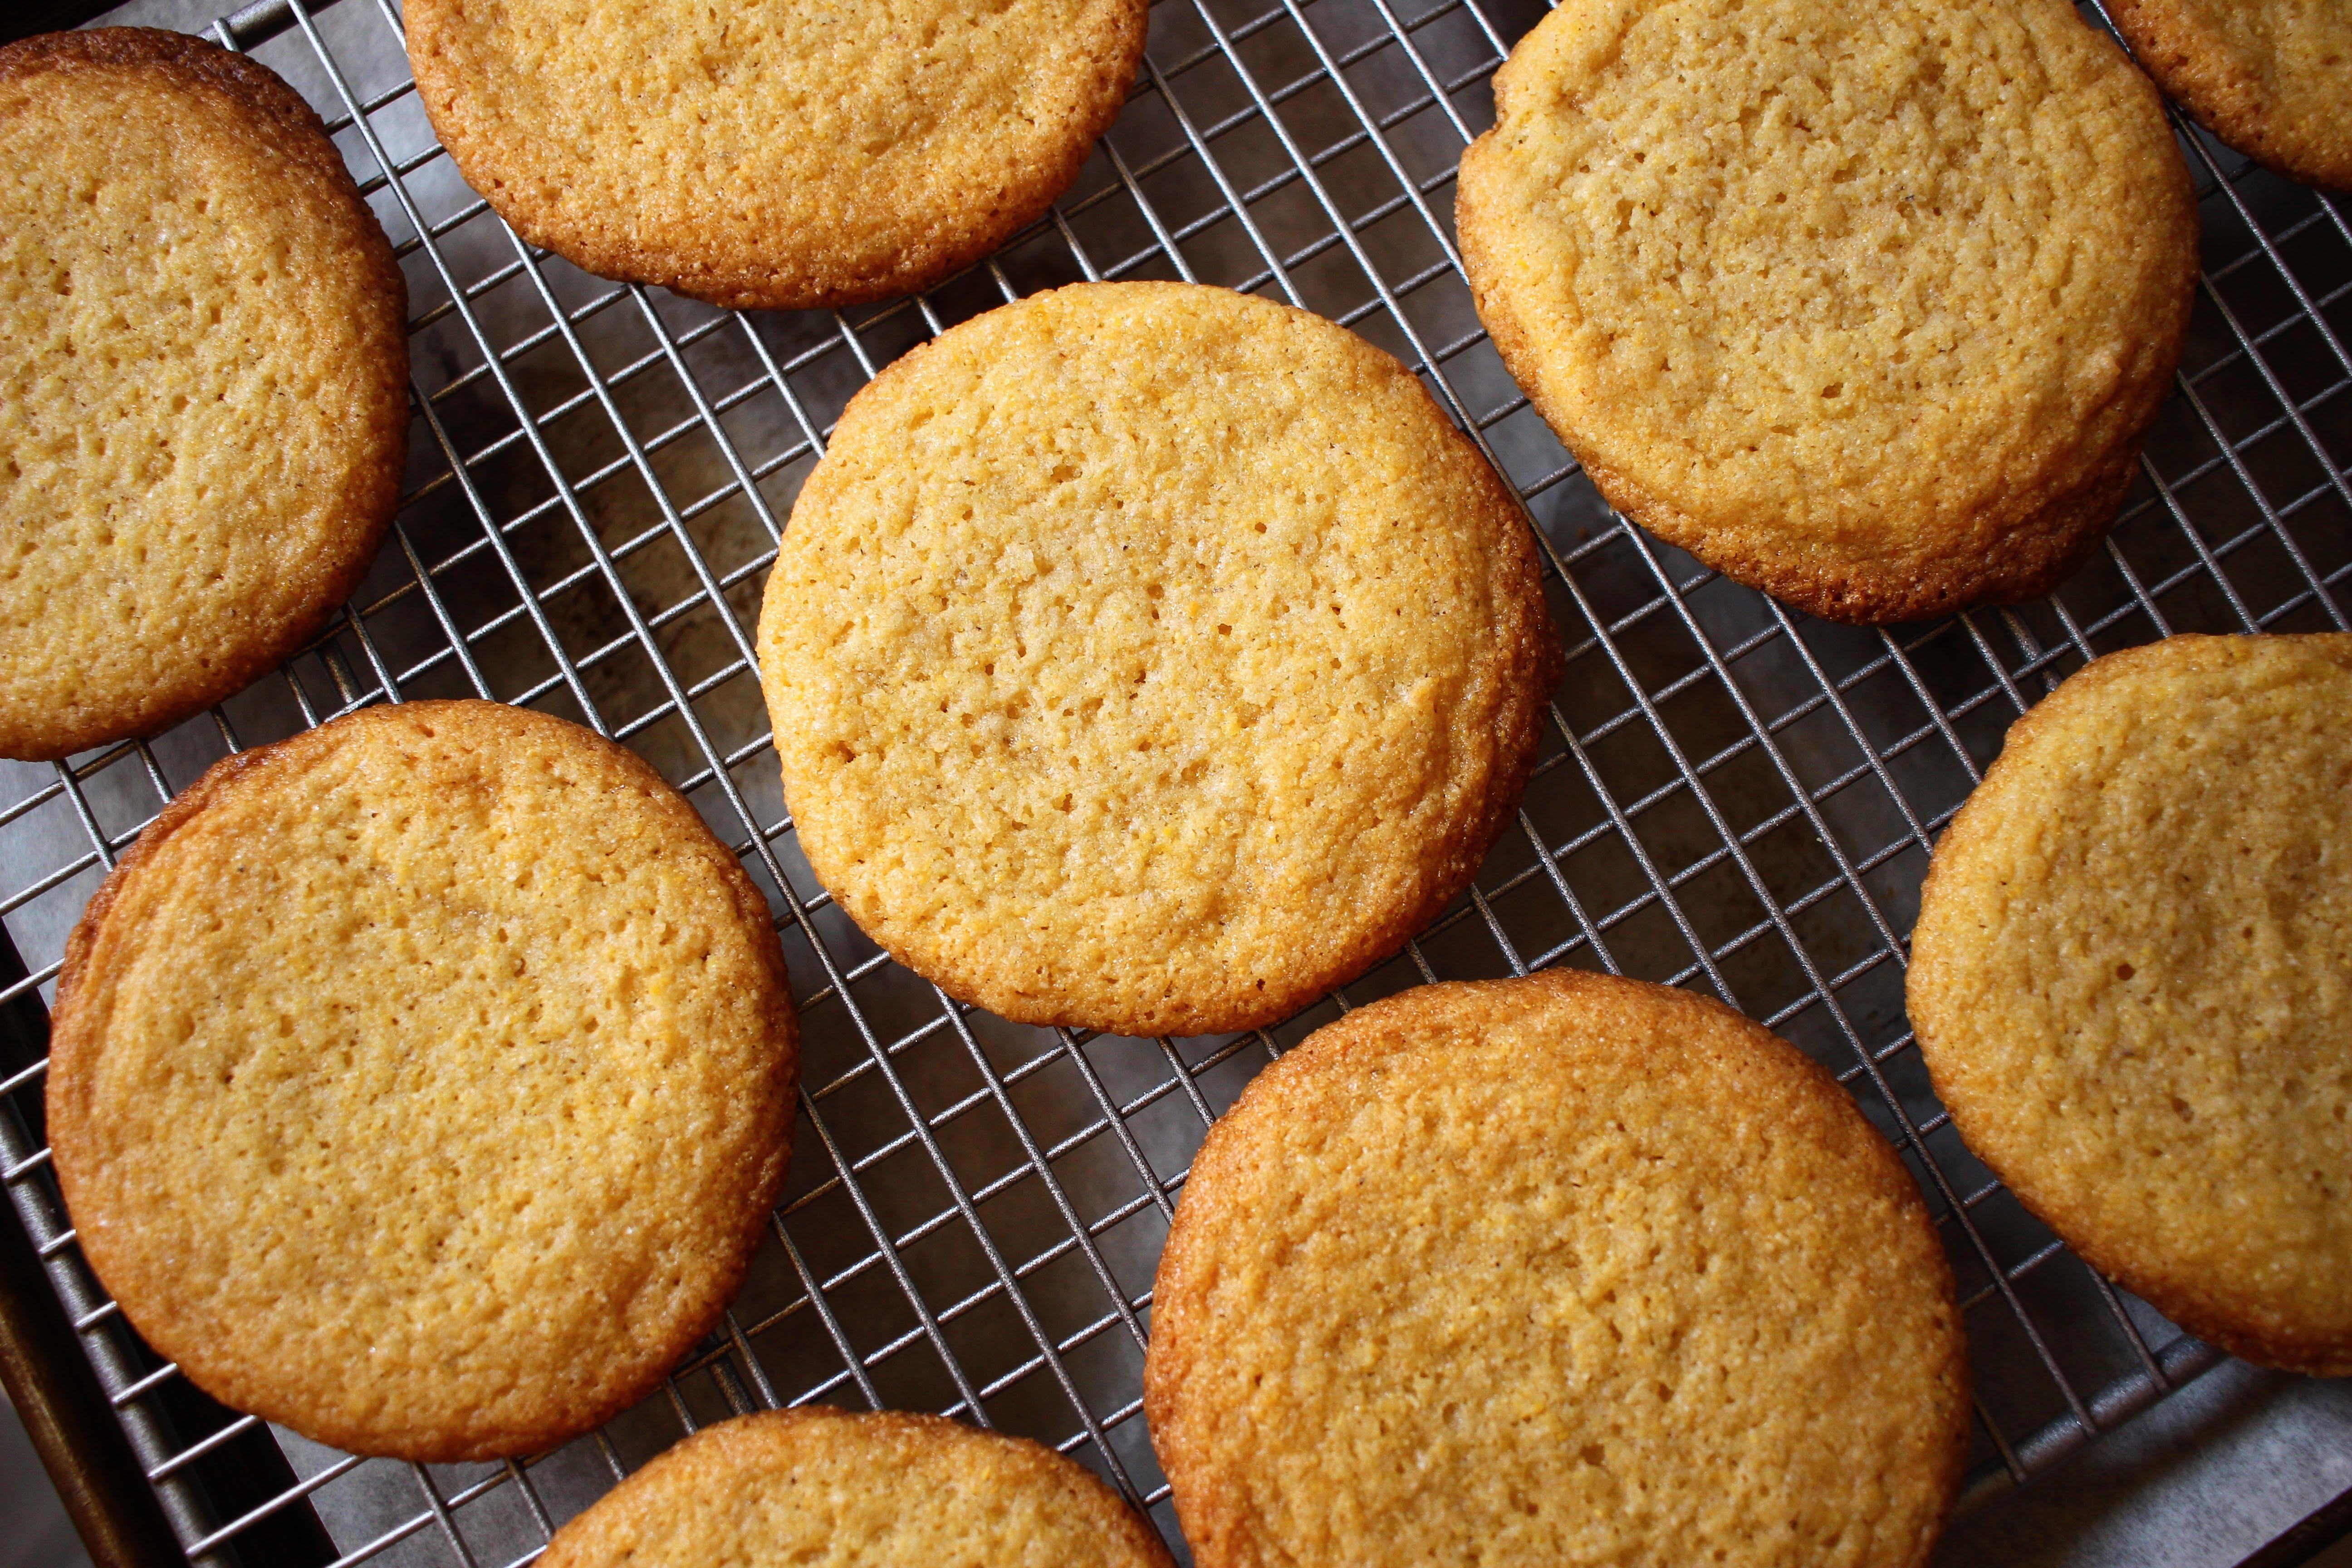 https://hips.hearstapps.com/hmg-prod.s3.amazonaws.com/images/corn-cookies-horizontal-1-jpg-1592933932.jpg